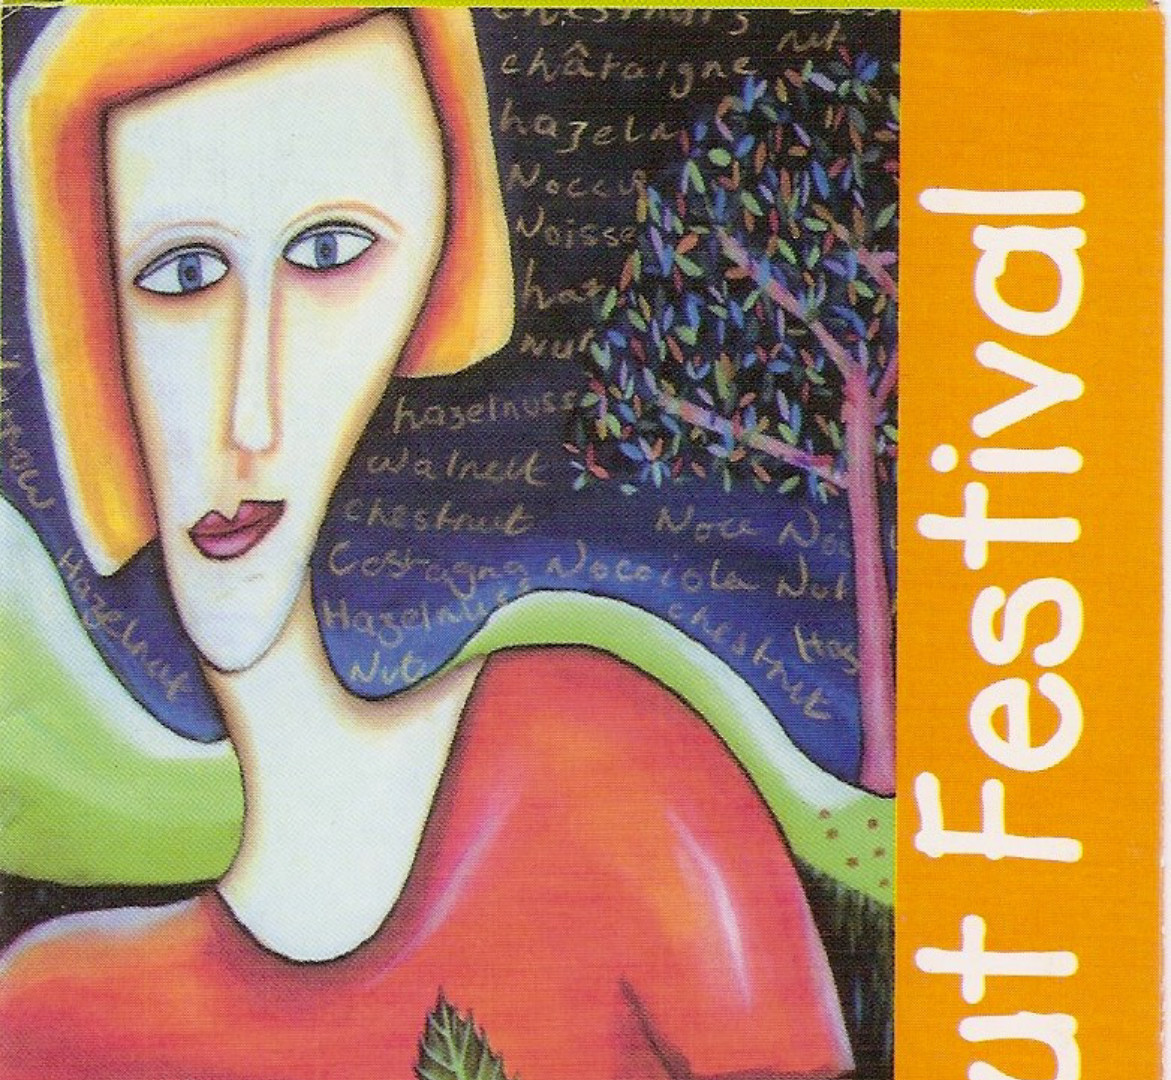 Wandi nut Festival Festival 2005 Program